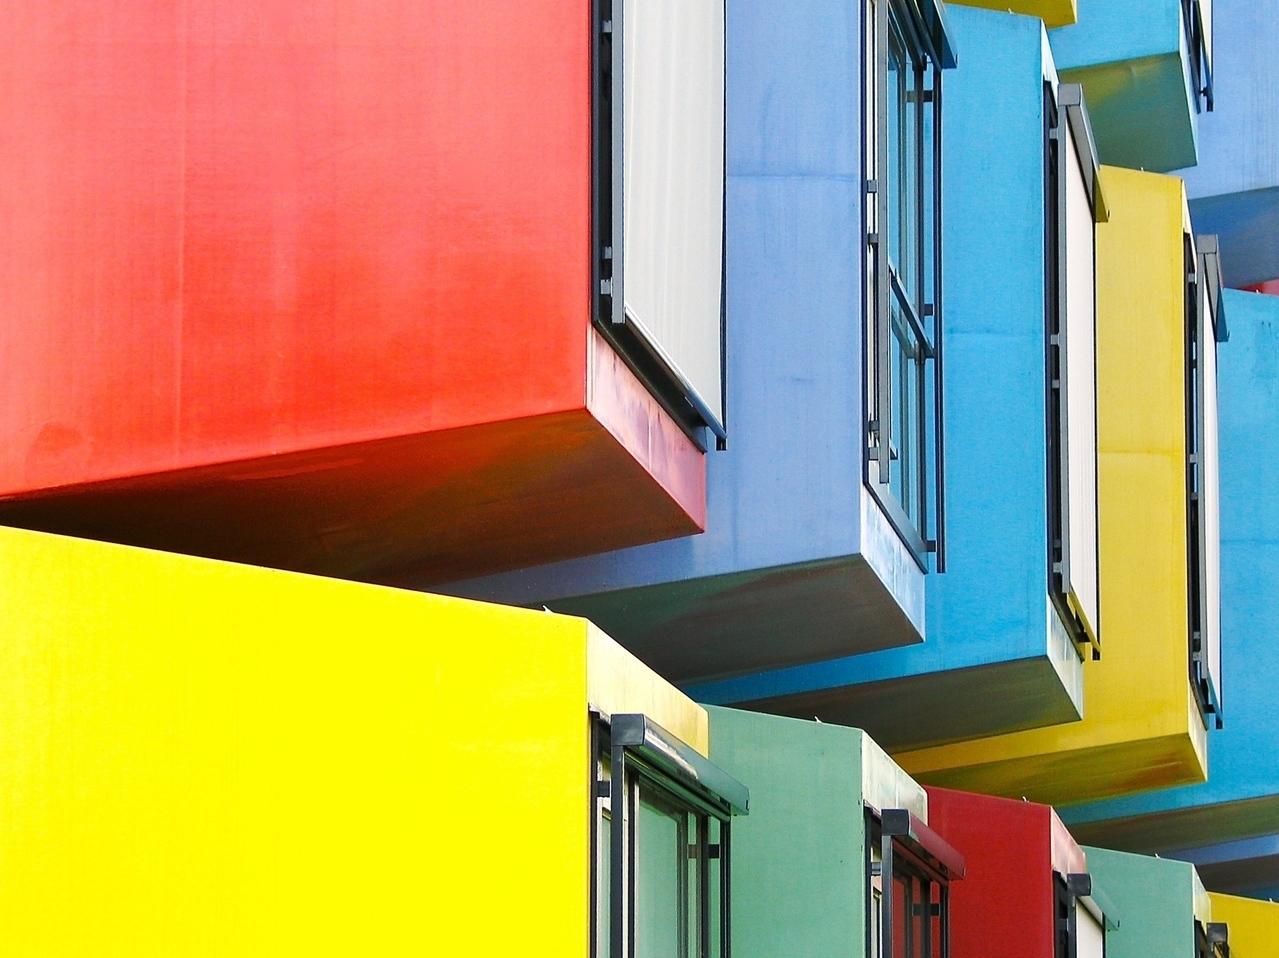 Barevné domy - okna - reality - byty - bytový dům - vzroste cena nemovitosti